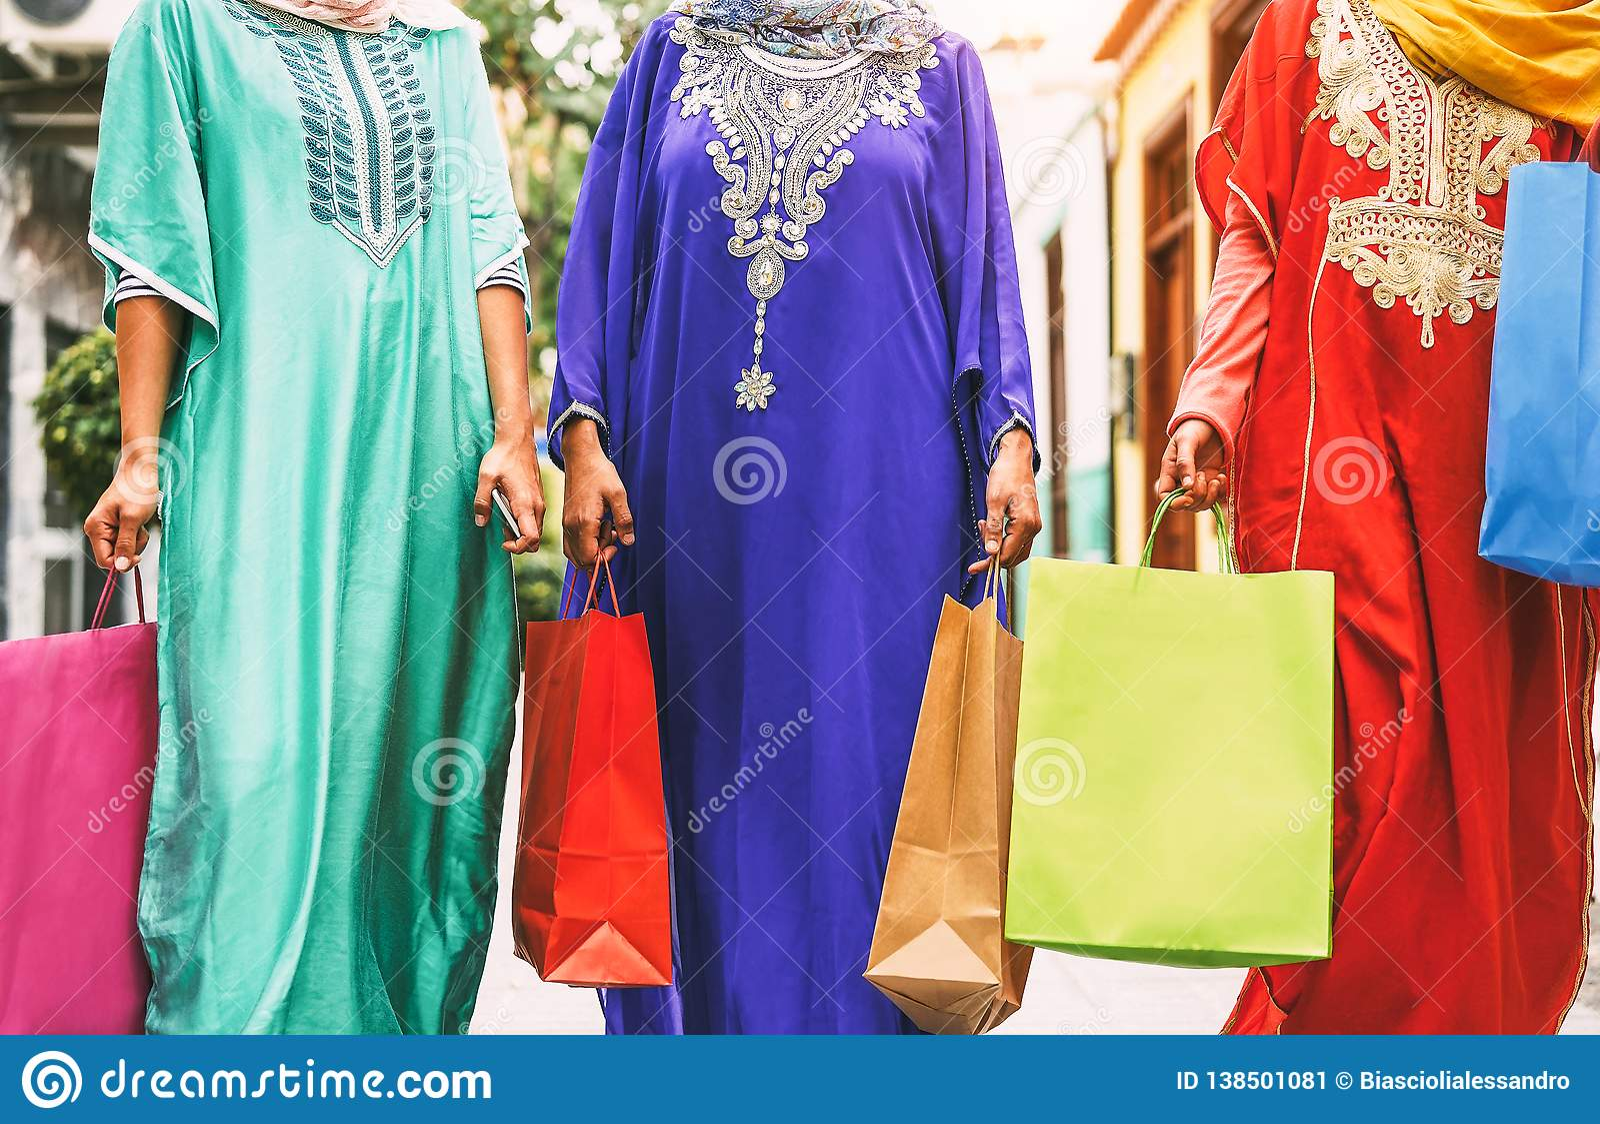 Happy Muslim women doing shopping in the city center - Arabian teen girls having fun buying new traditional Arab clothes in mall